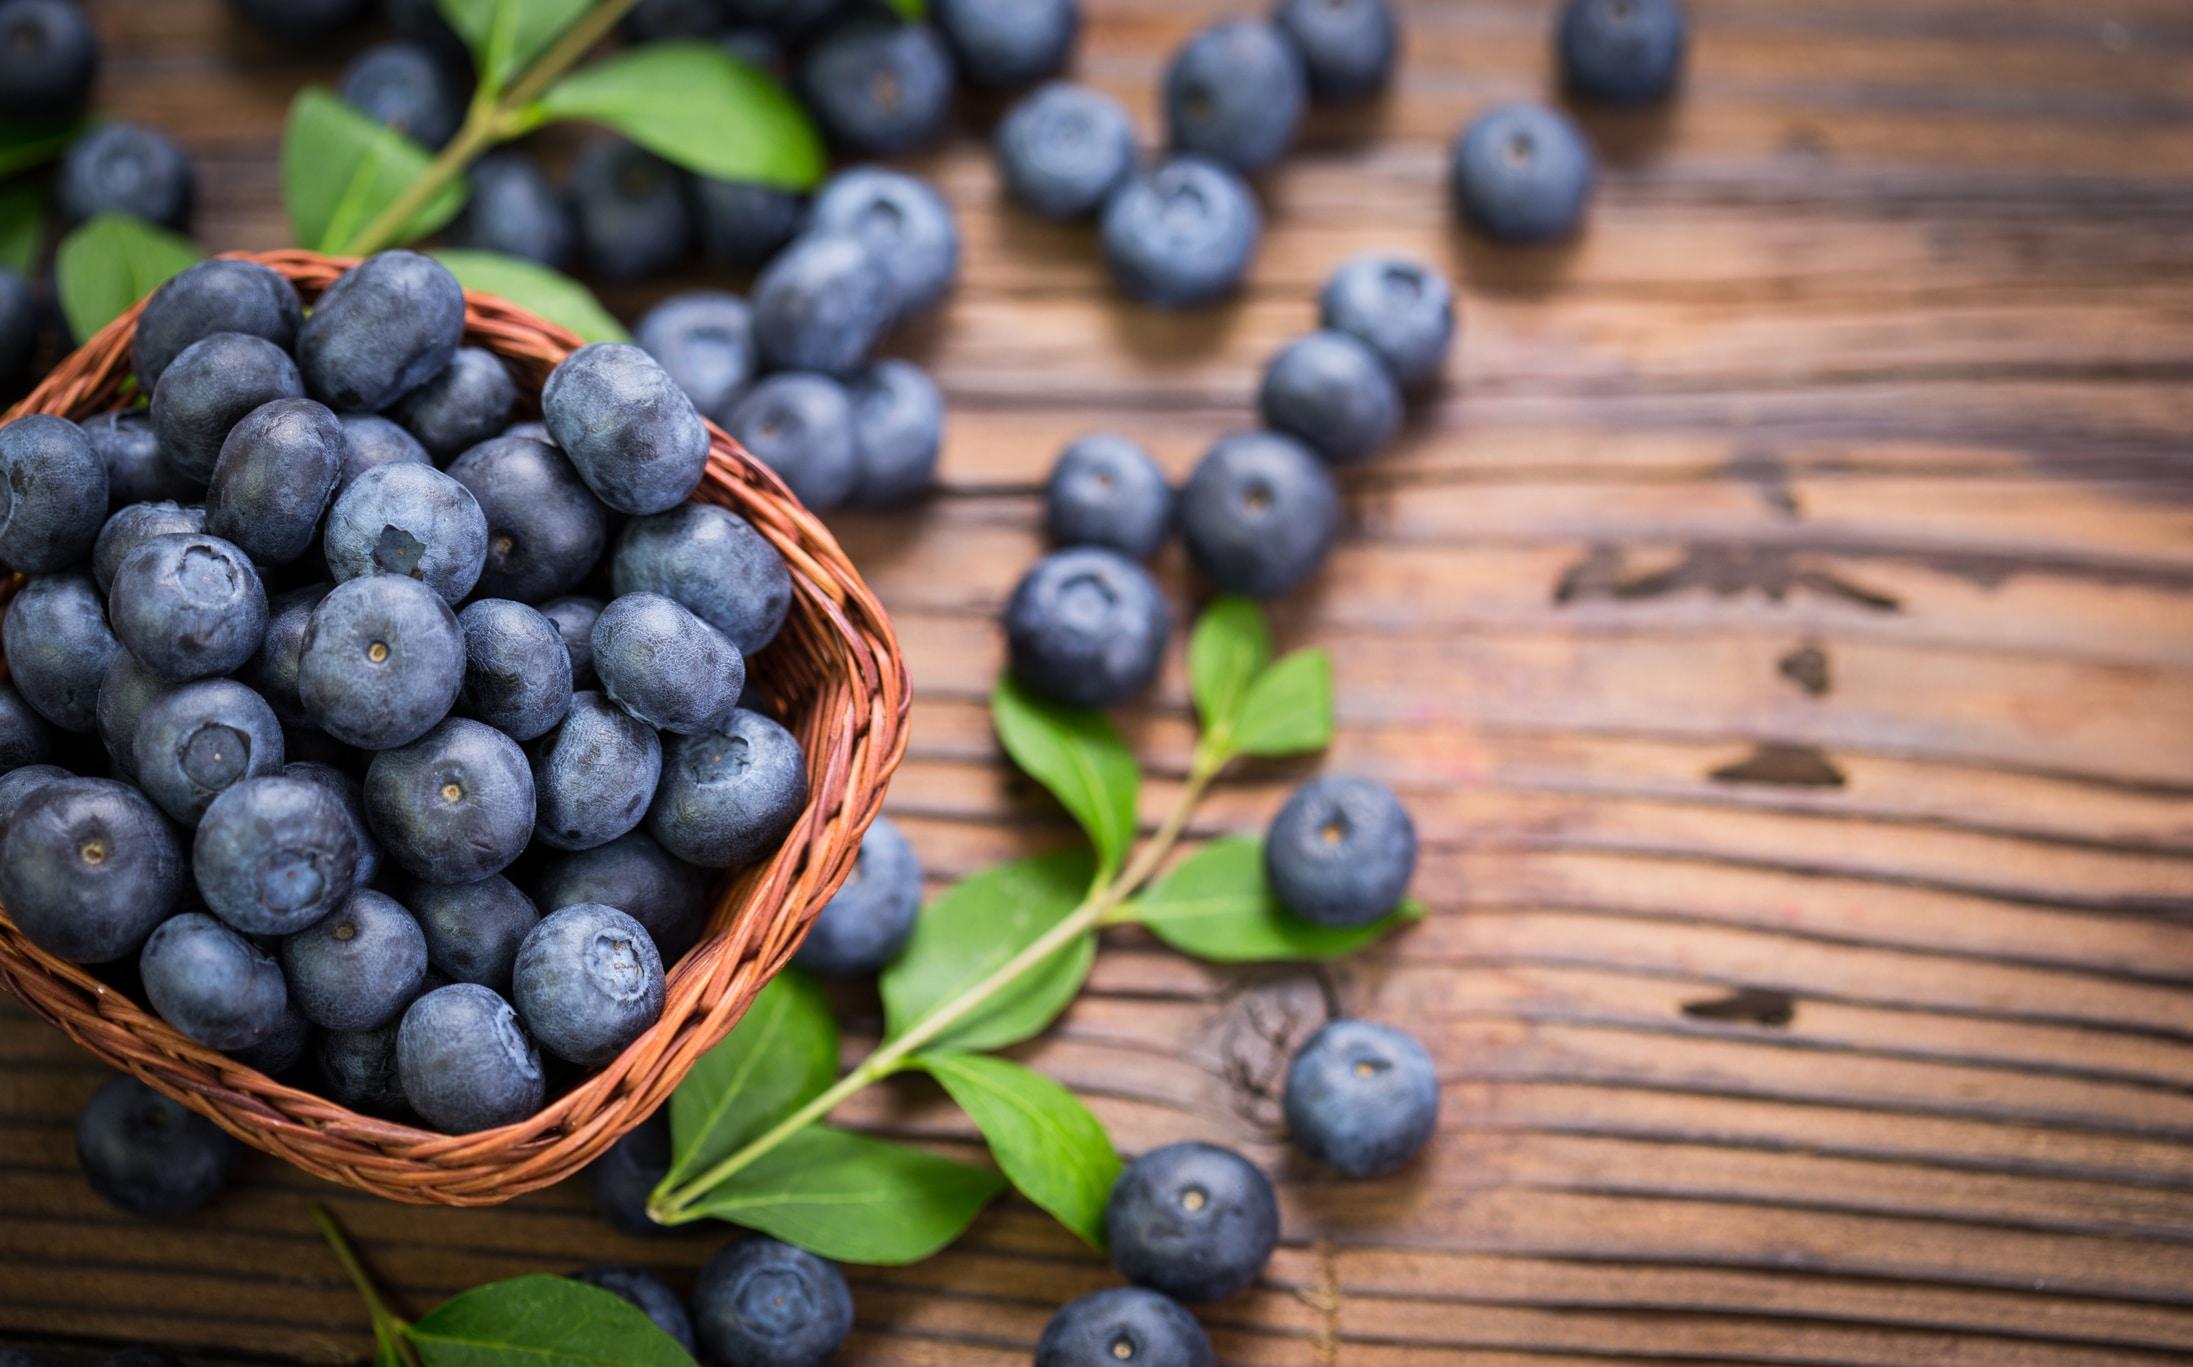 Blueberry Skin Care Hacks